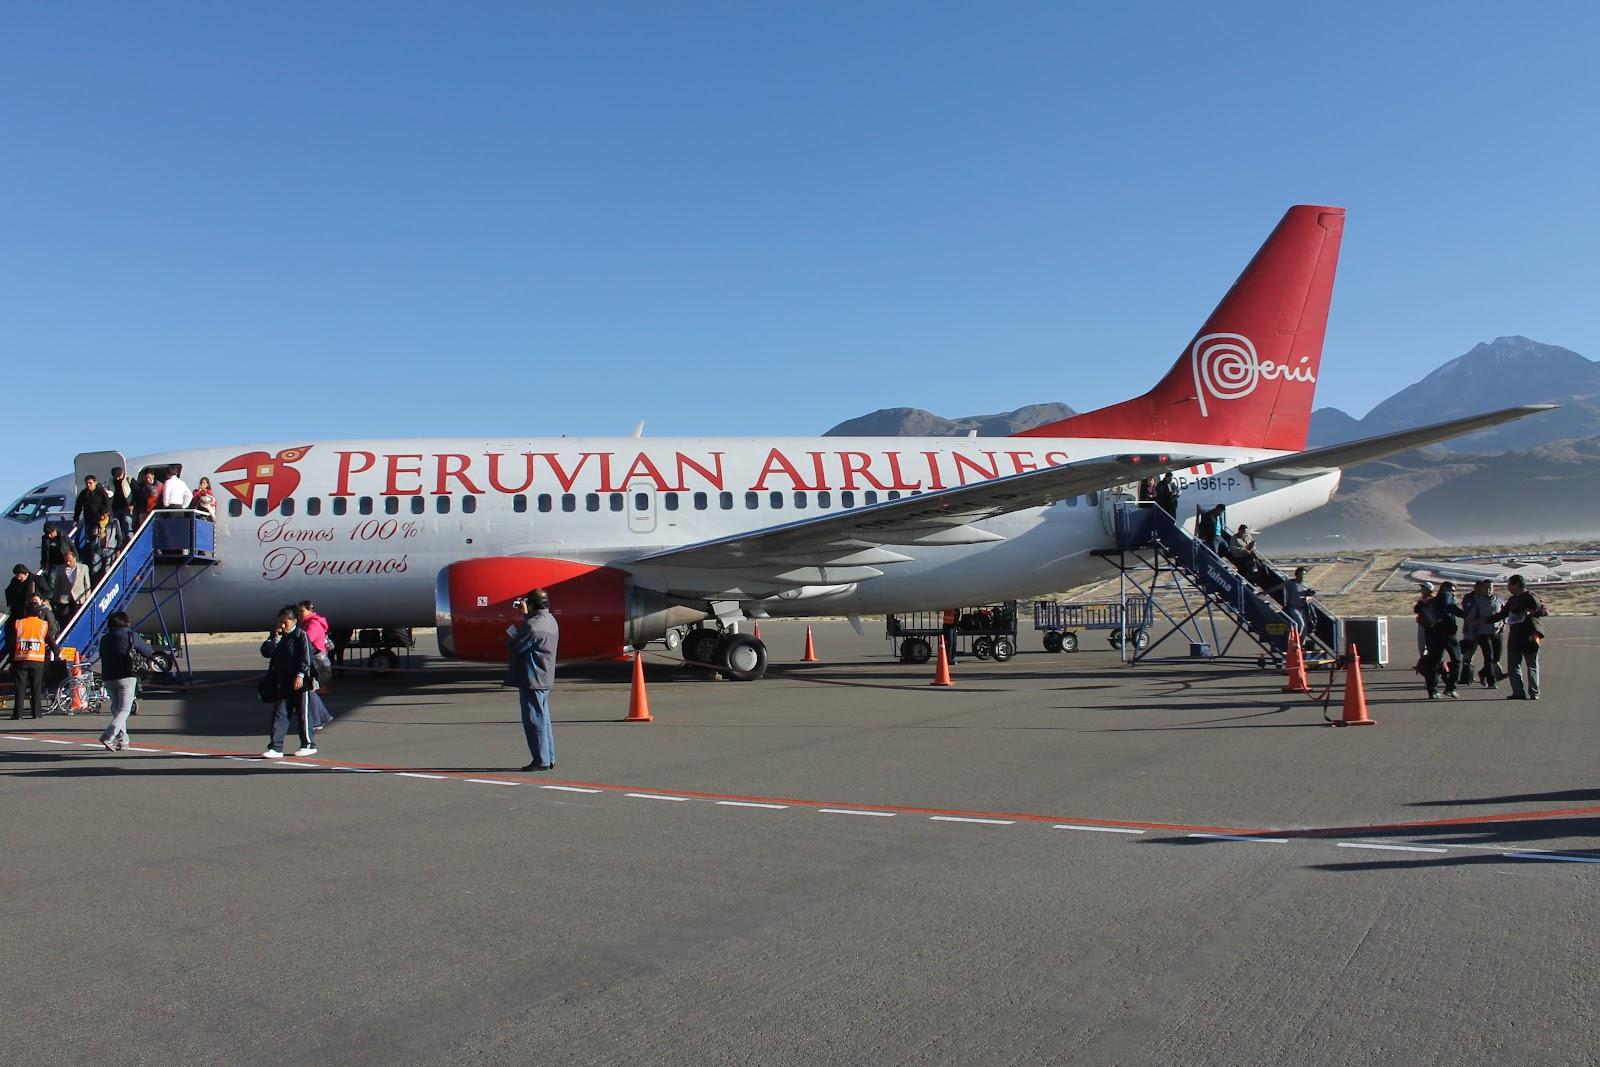 Péruvian Airlines